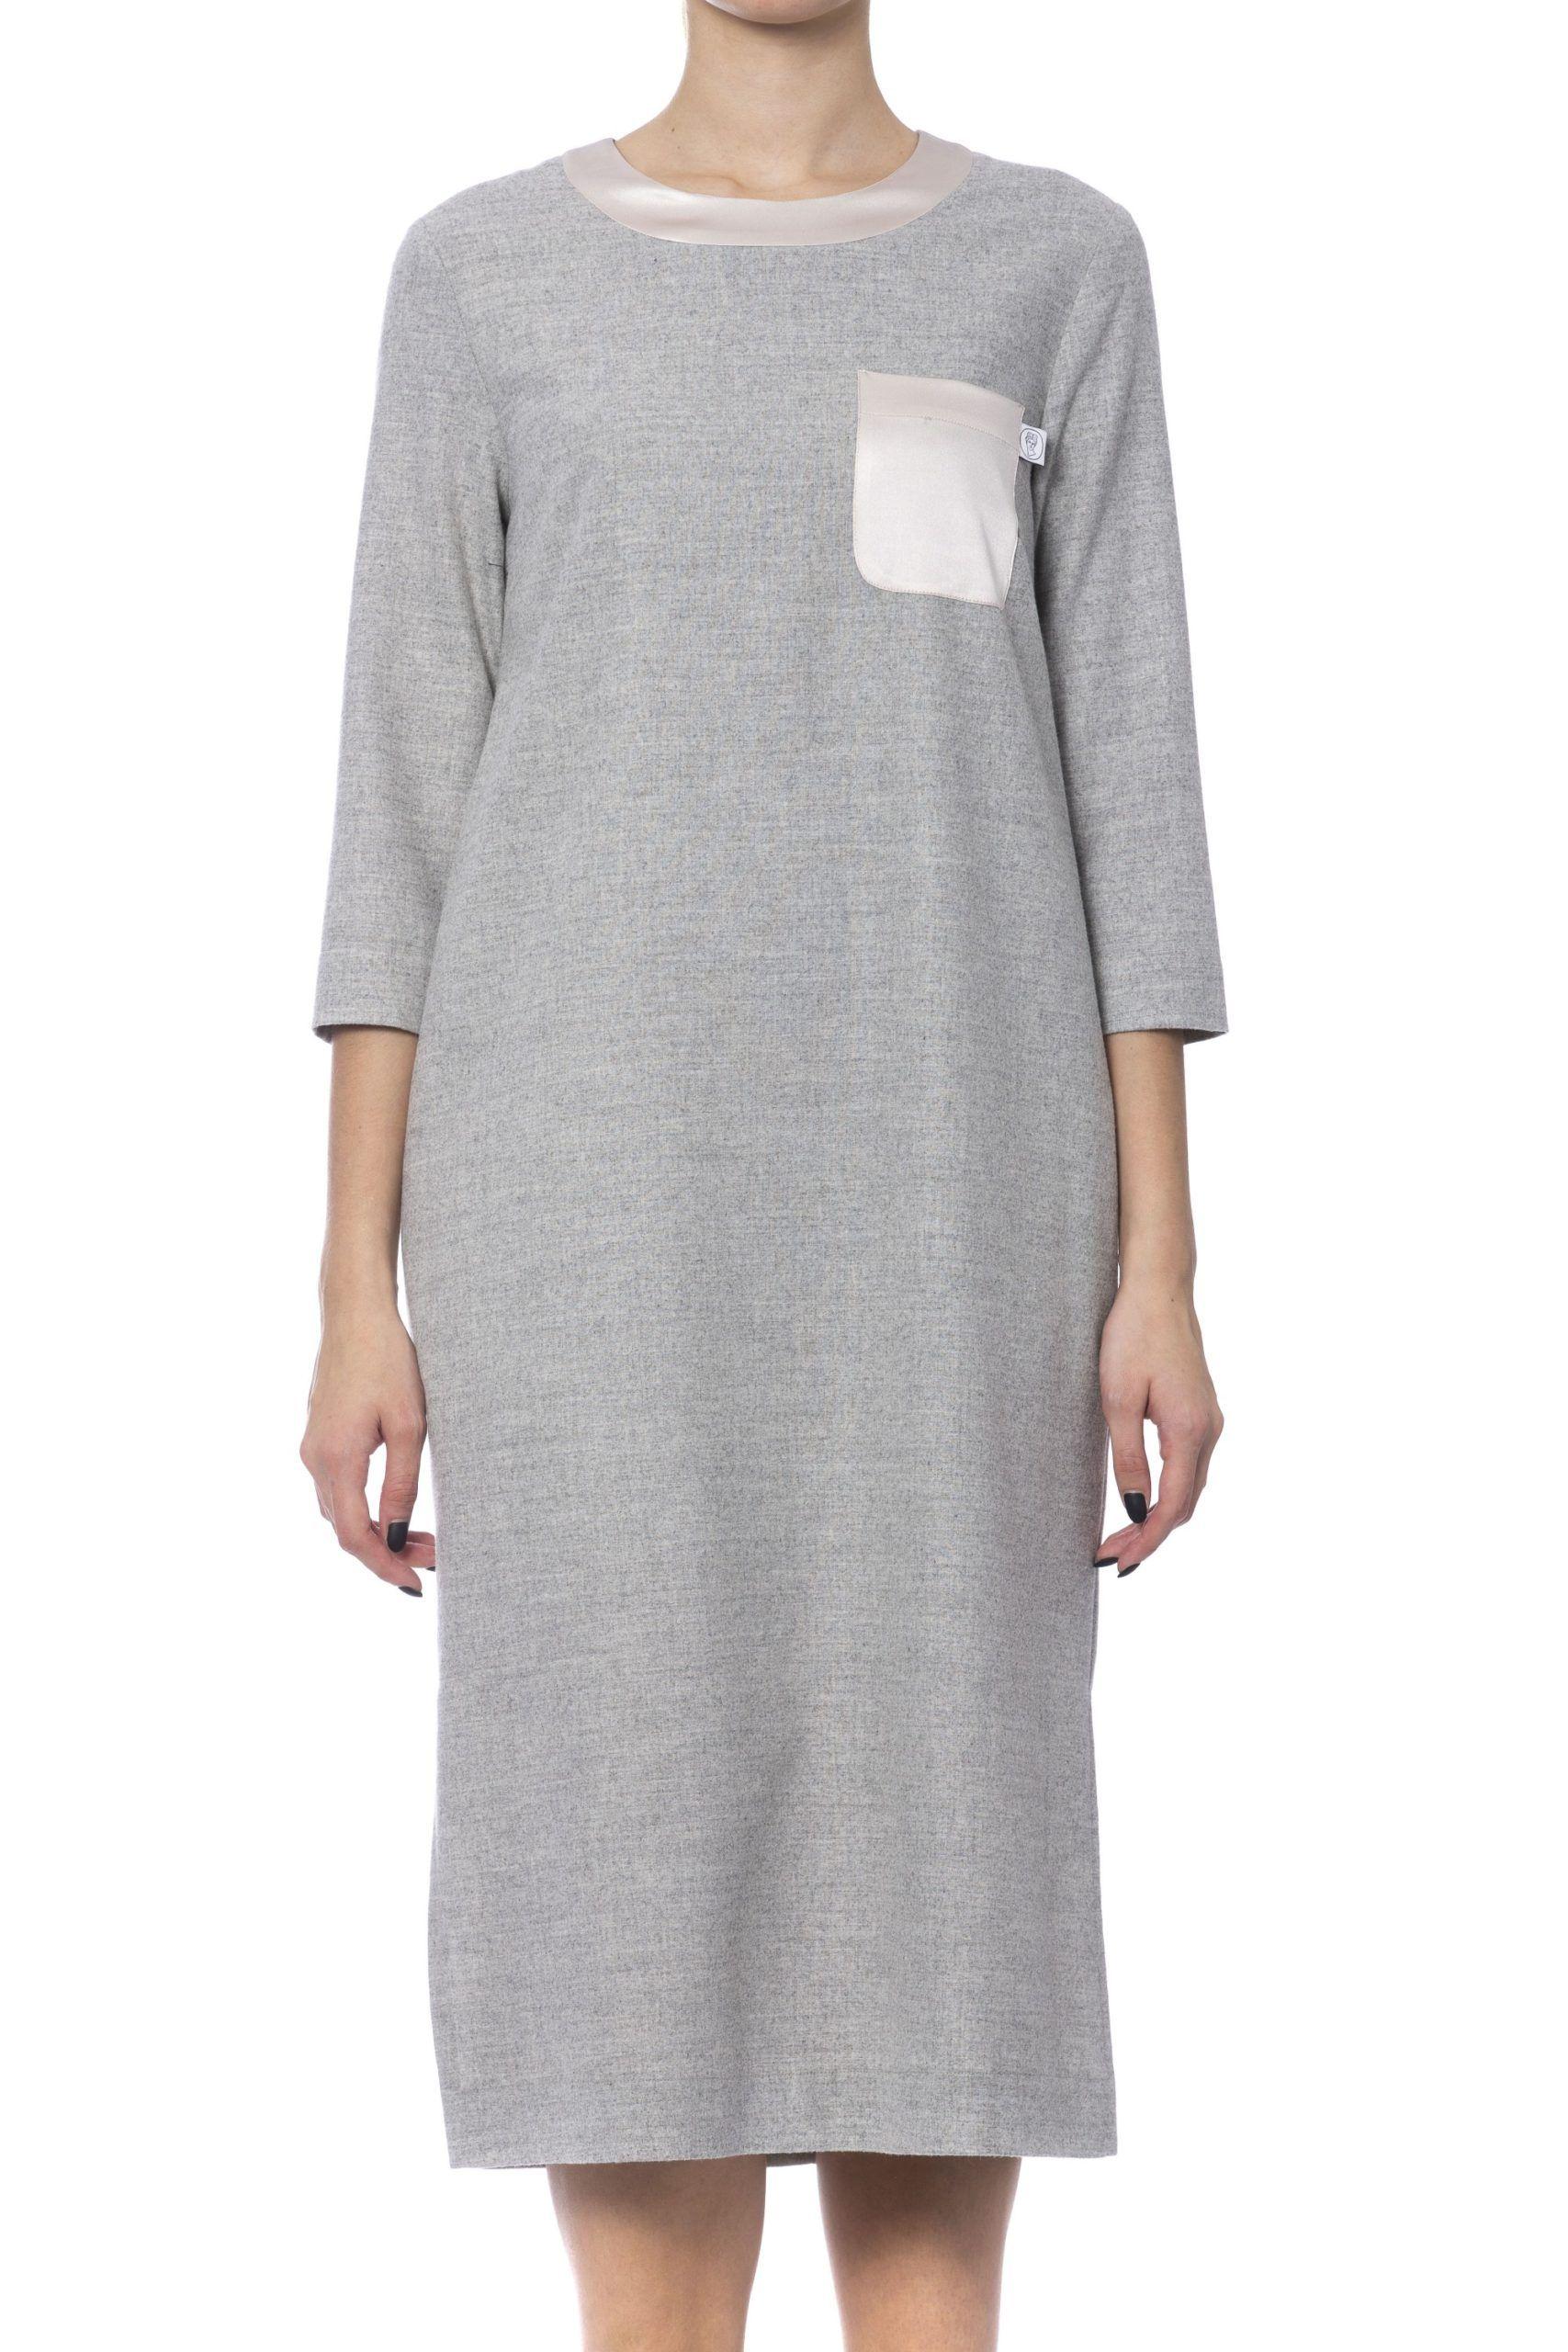 Peserico Bgrigio Dress